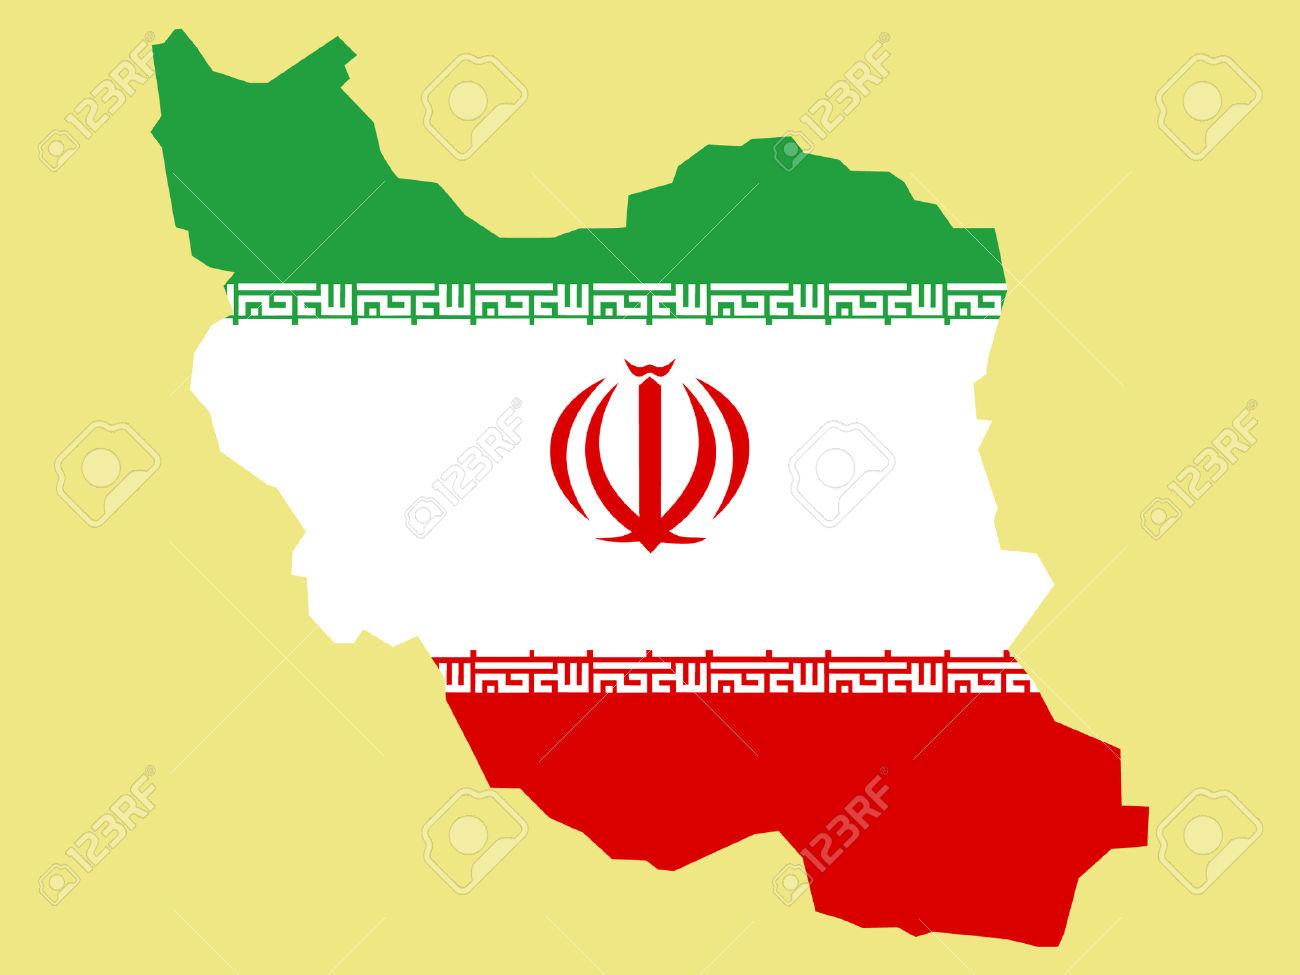 Iran clipart vector freeuse iranian: map of Iran and | Clipart Panda - Free Clipart Images vector freeuse